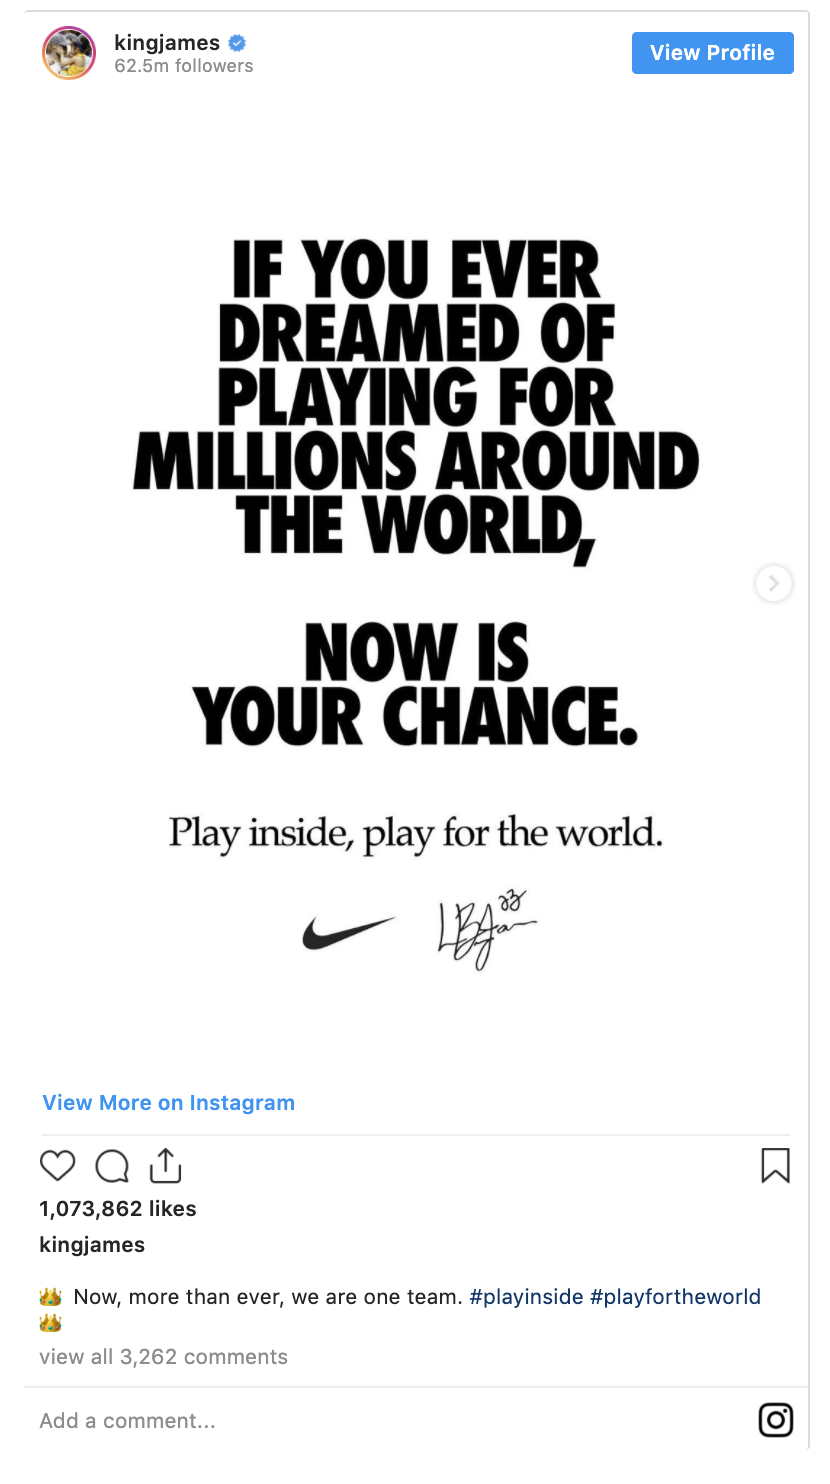 lebron james instagram nike post